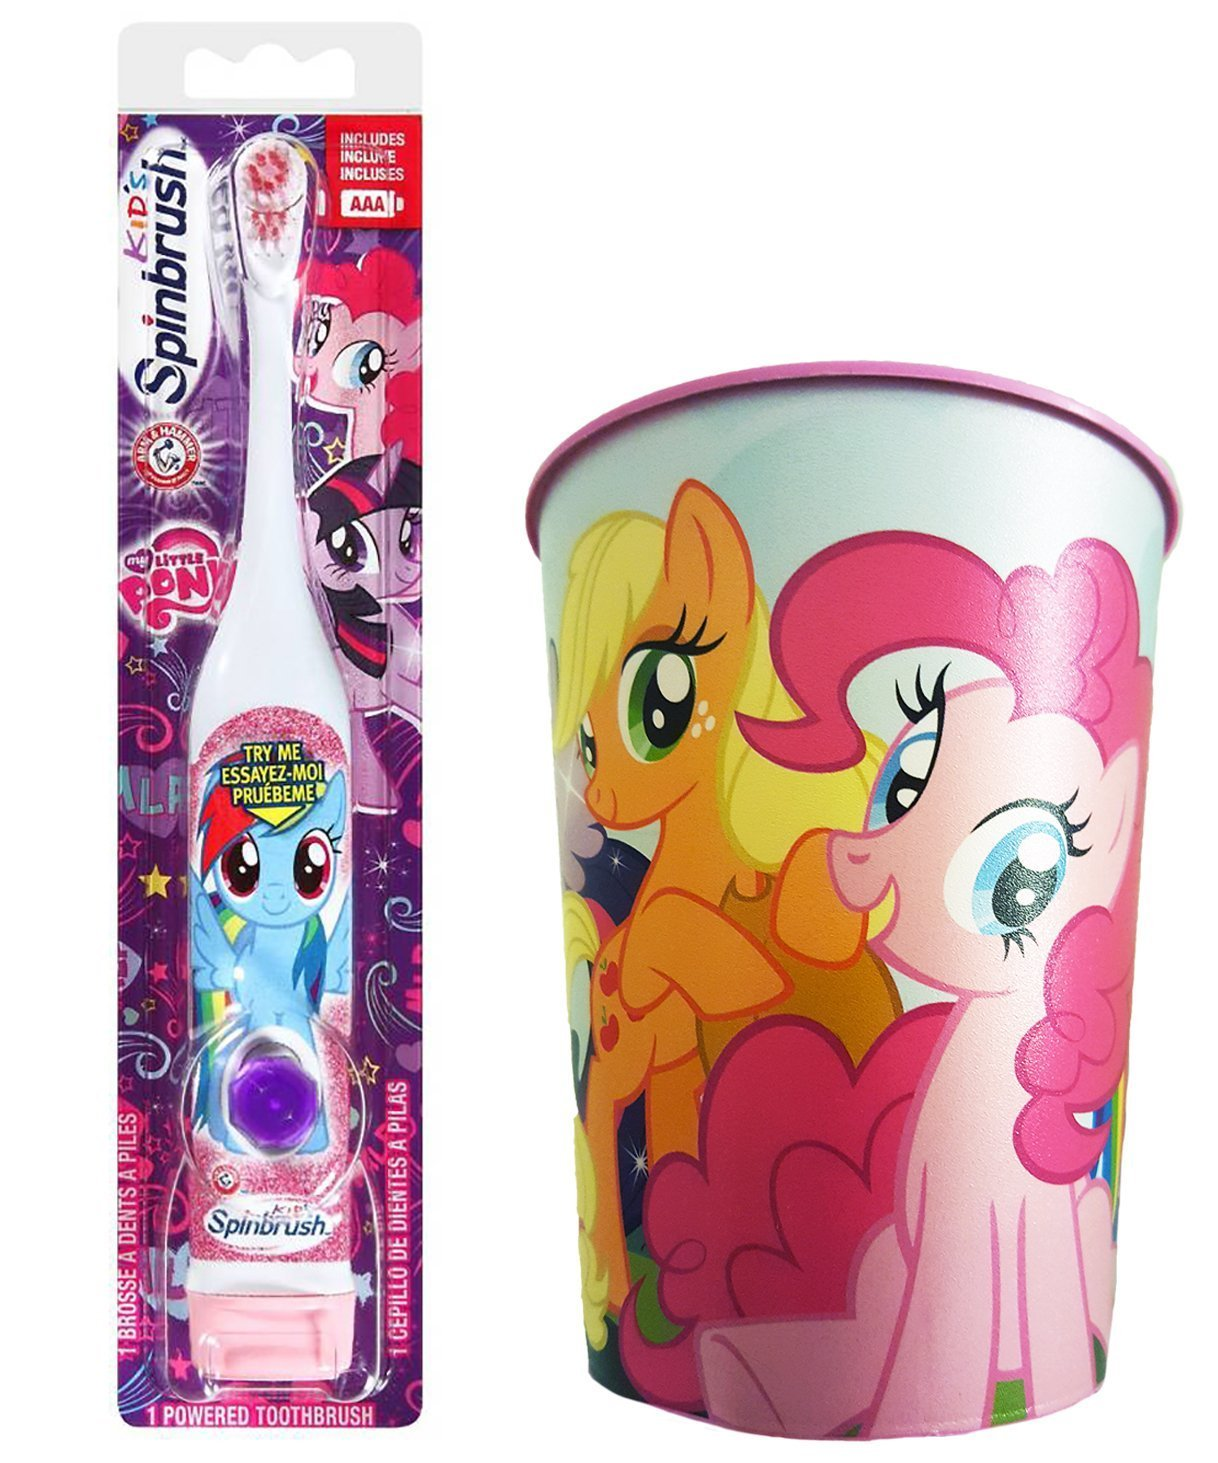 My Little Pony Rainbow Dash Toothbrush Bundle 2 Items Spinbrush Toothbrush My Little Pony Kids Rinse Cup Buy Online In Aruba At Aruba Desertcart Com Productid 35374572